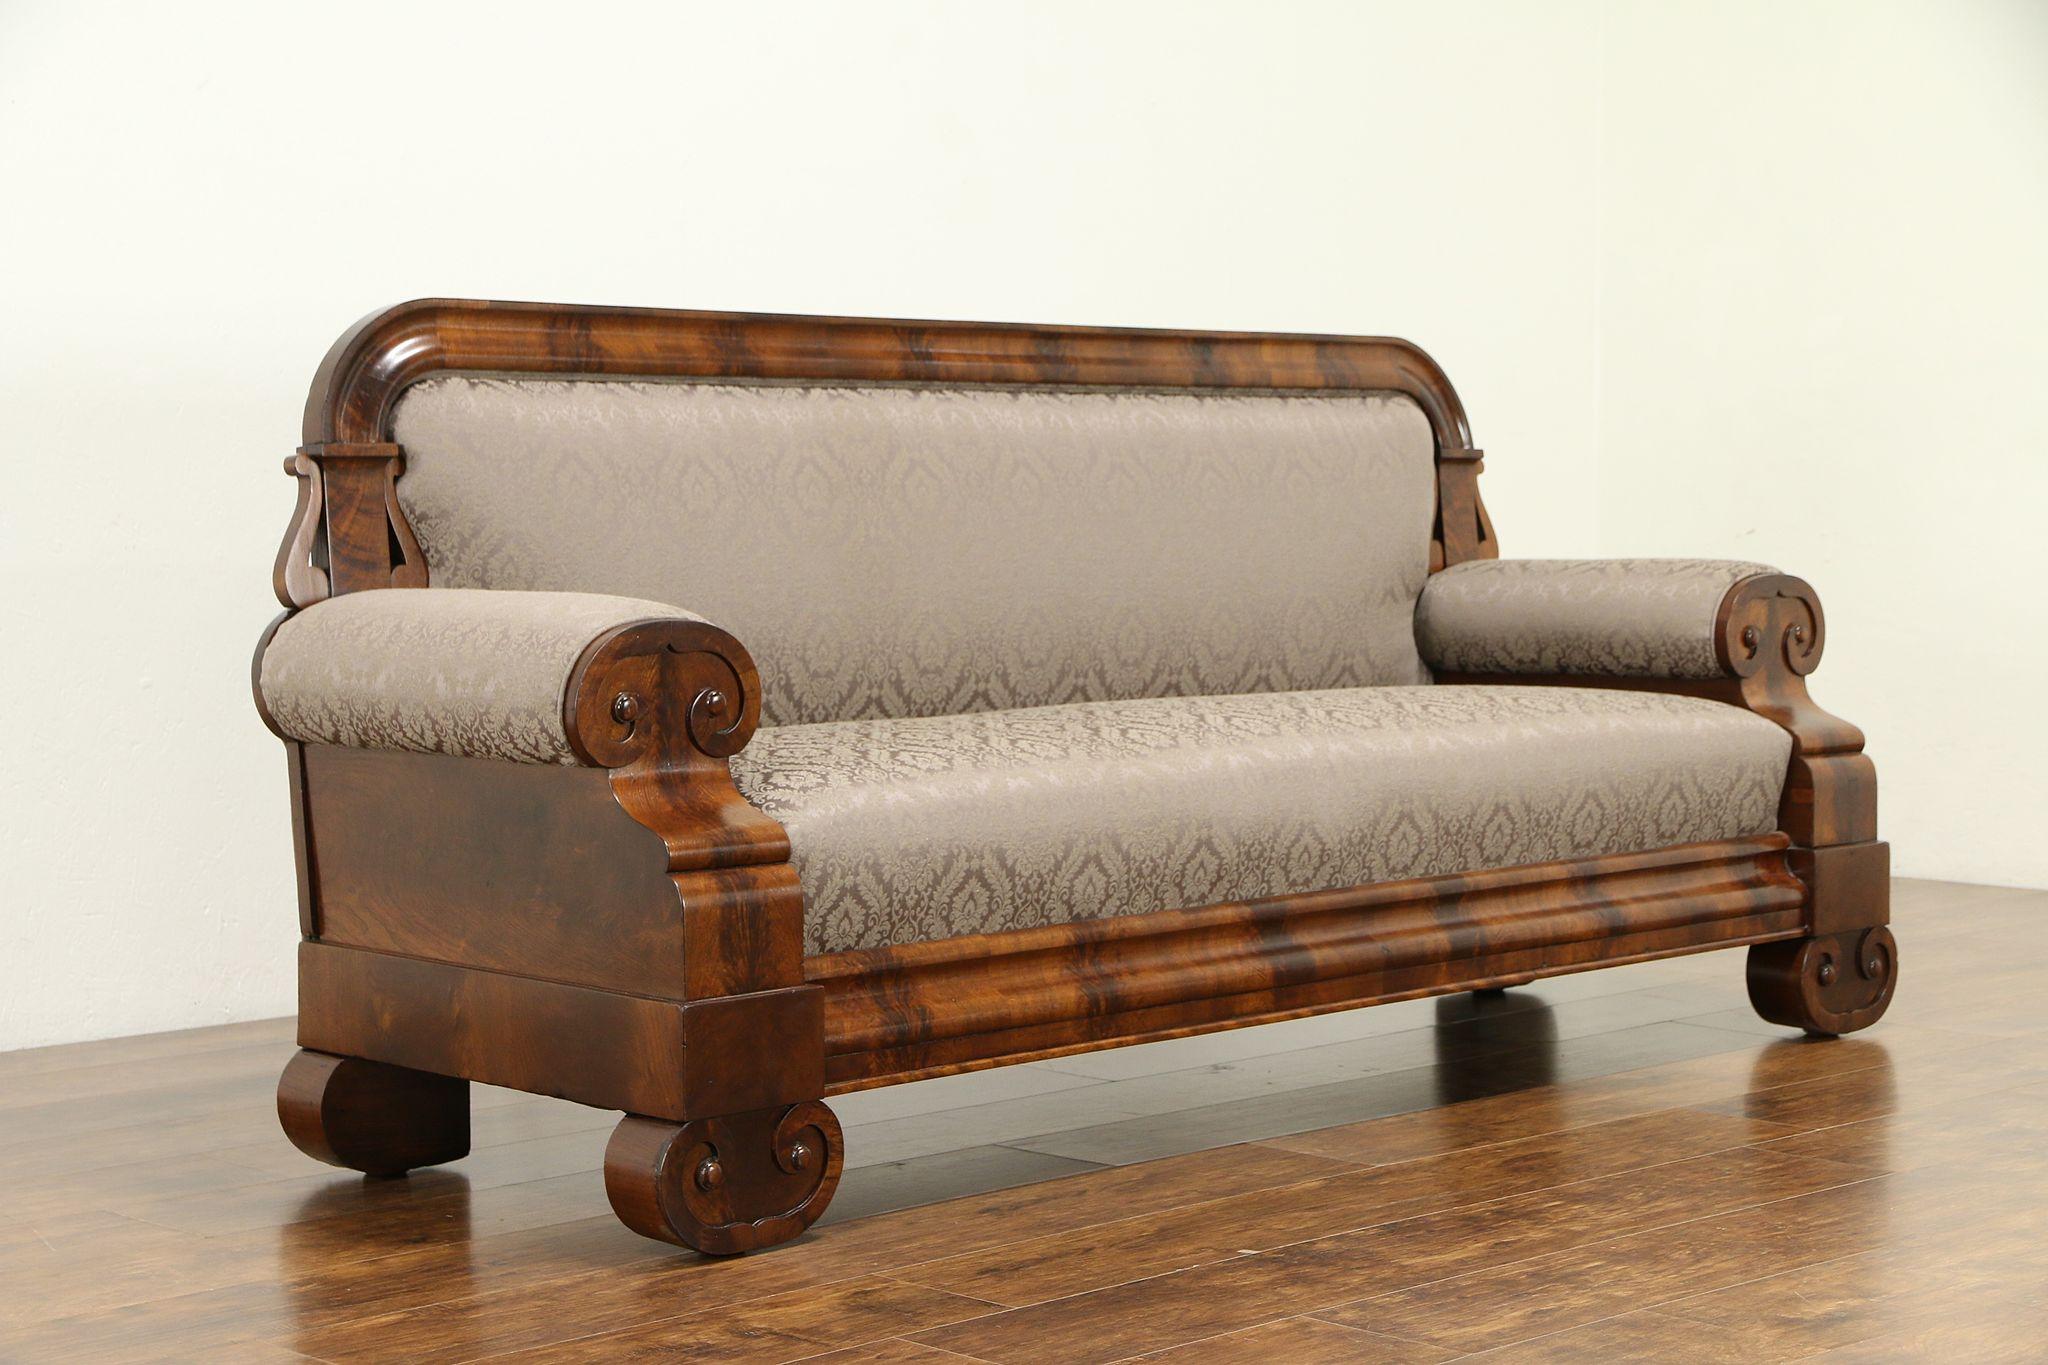 1830 Flame Mahogany Clical Sofa